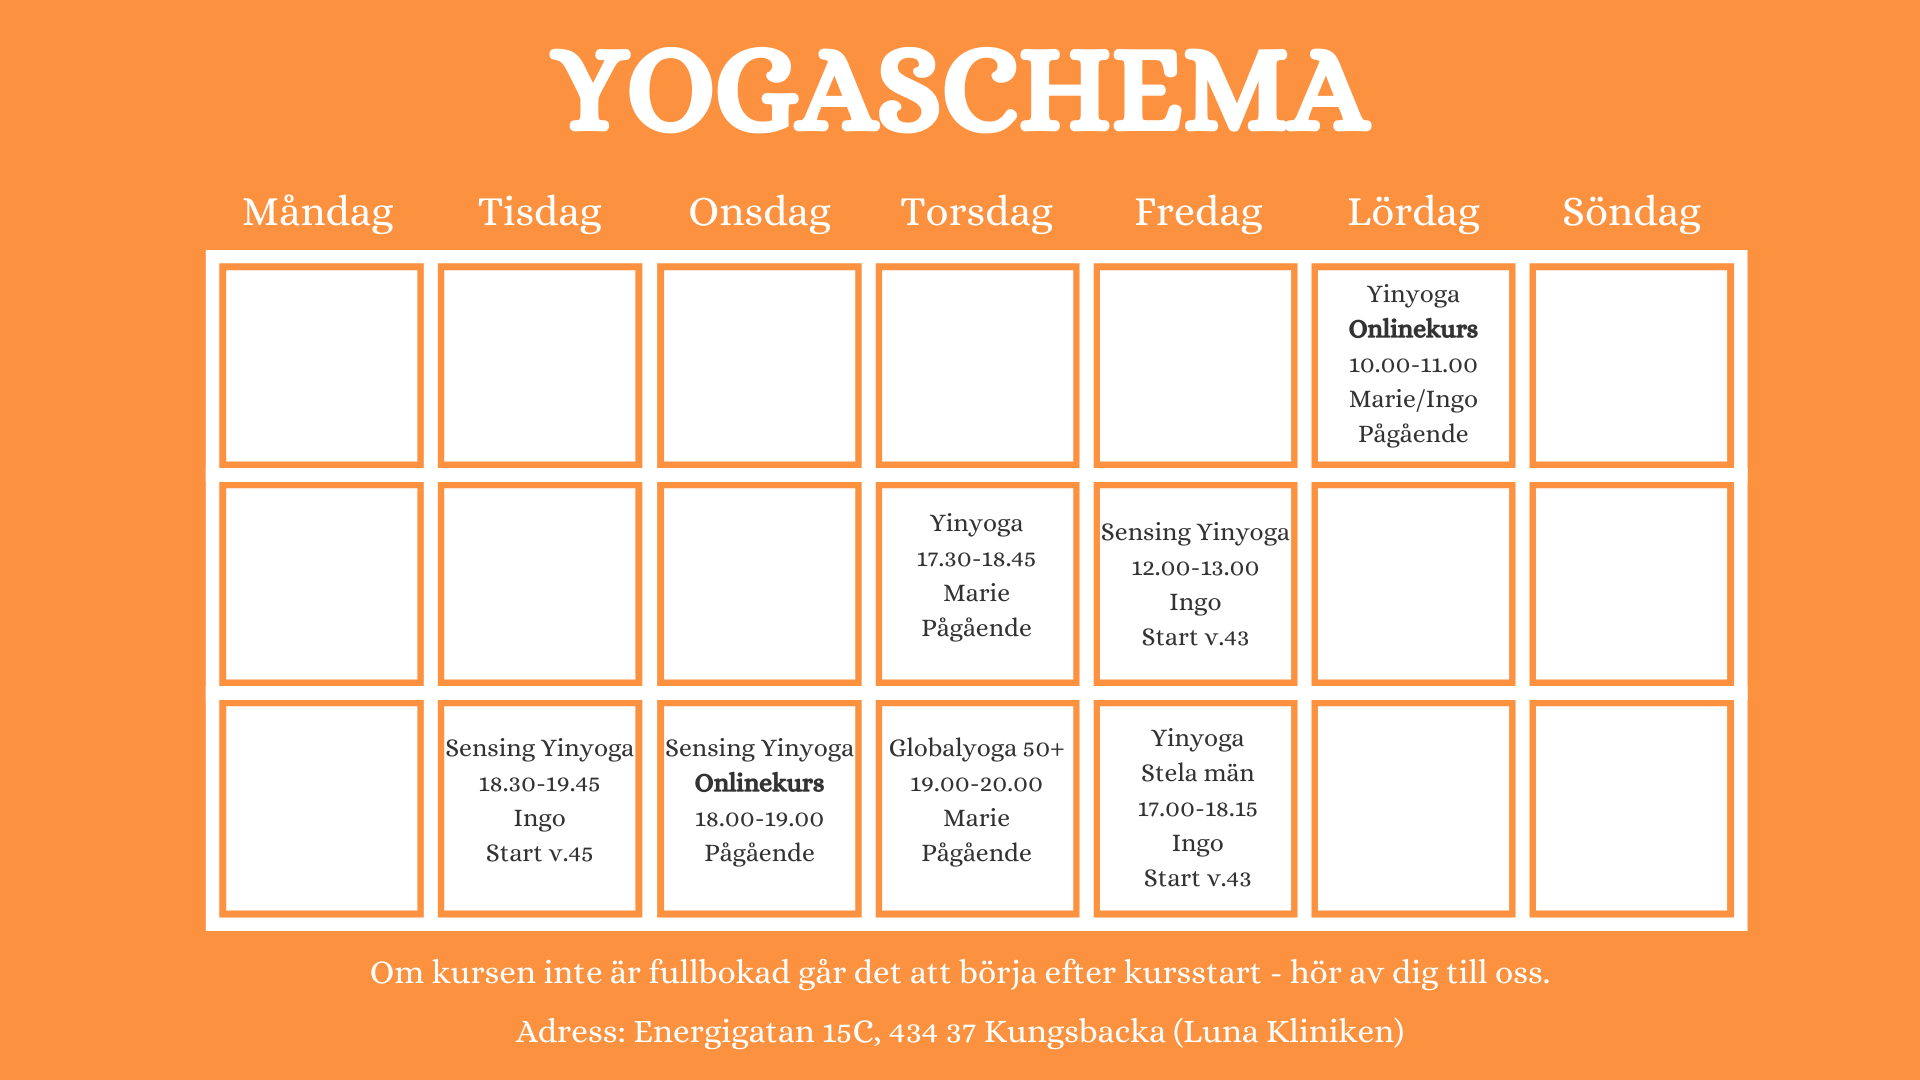 yogakurs kungsbacka yogaschema